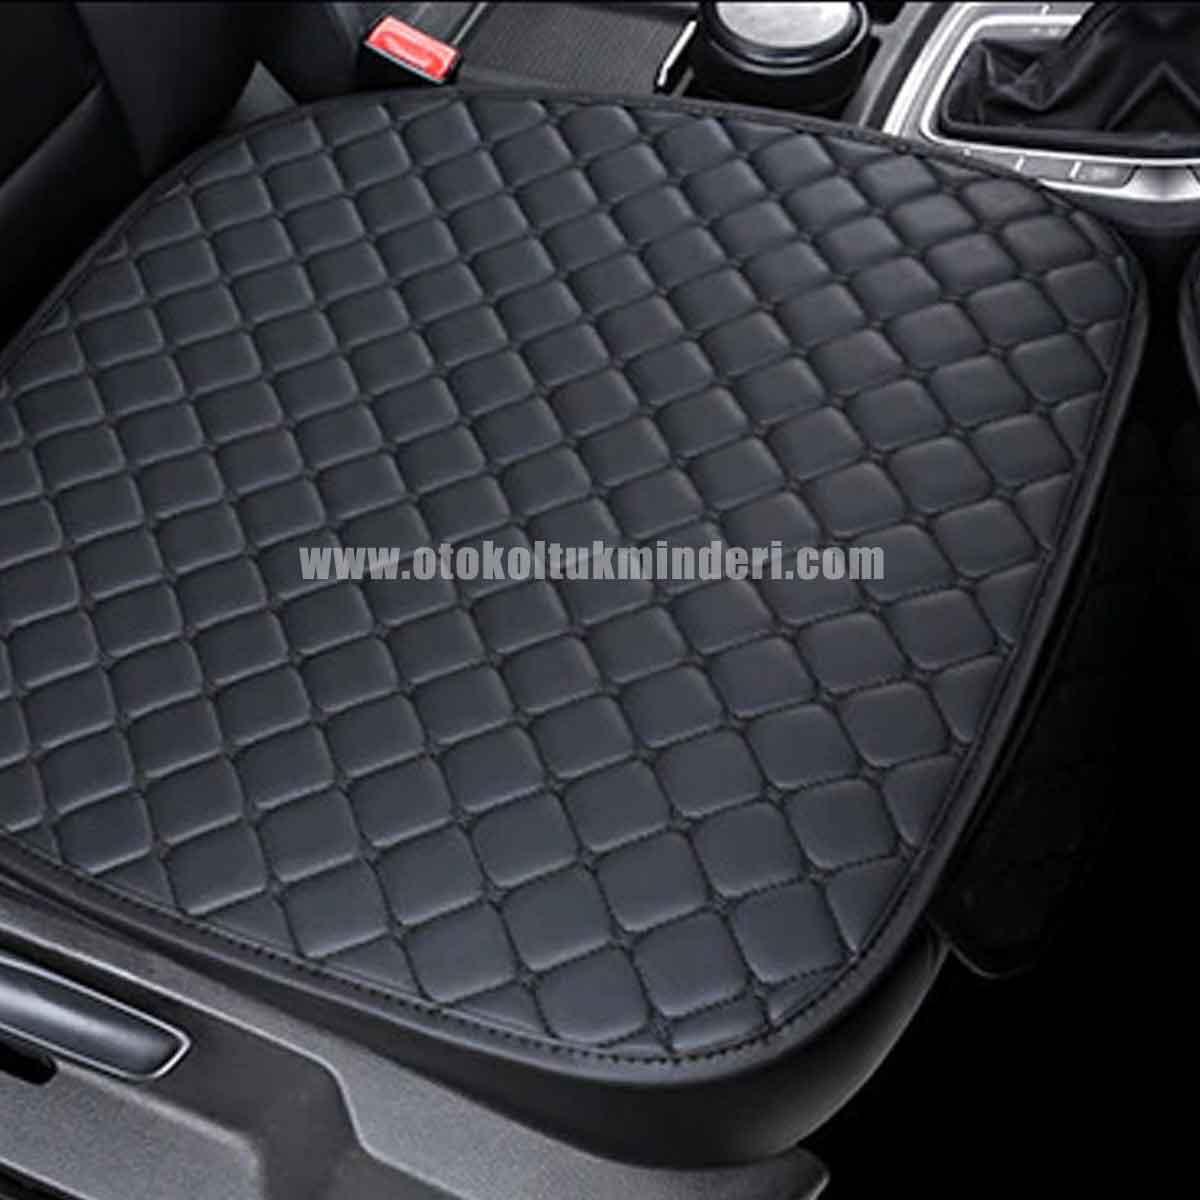 Mitsubishi oto koltuk kılıfı - Mitsubishi Koltuk minderi Siyah Deri Cepli